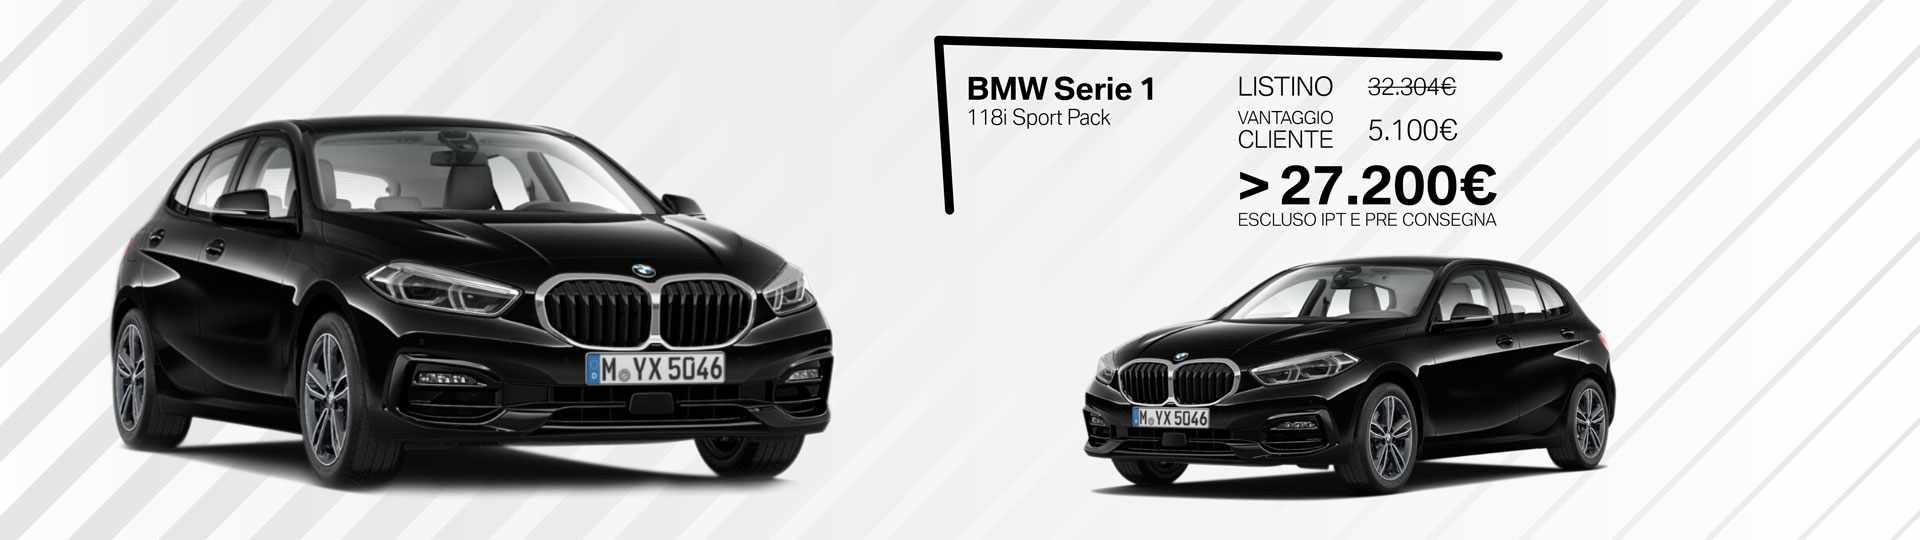 BMW-Serie-1-Sport_LP-min.jpg